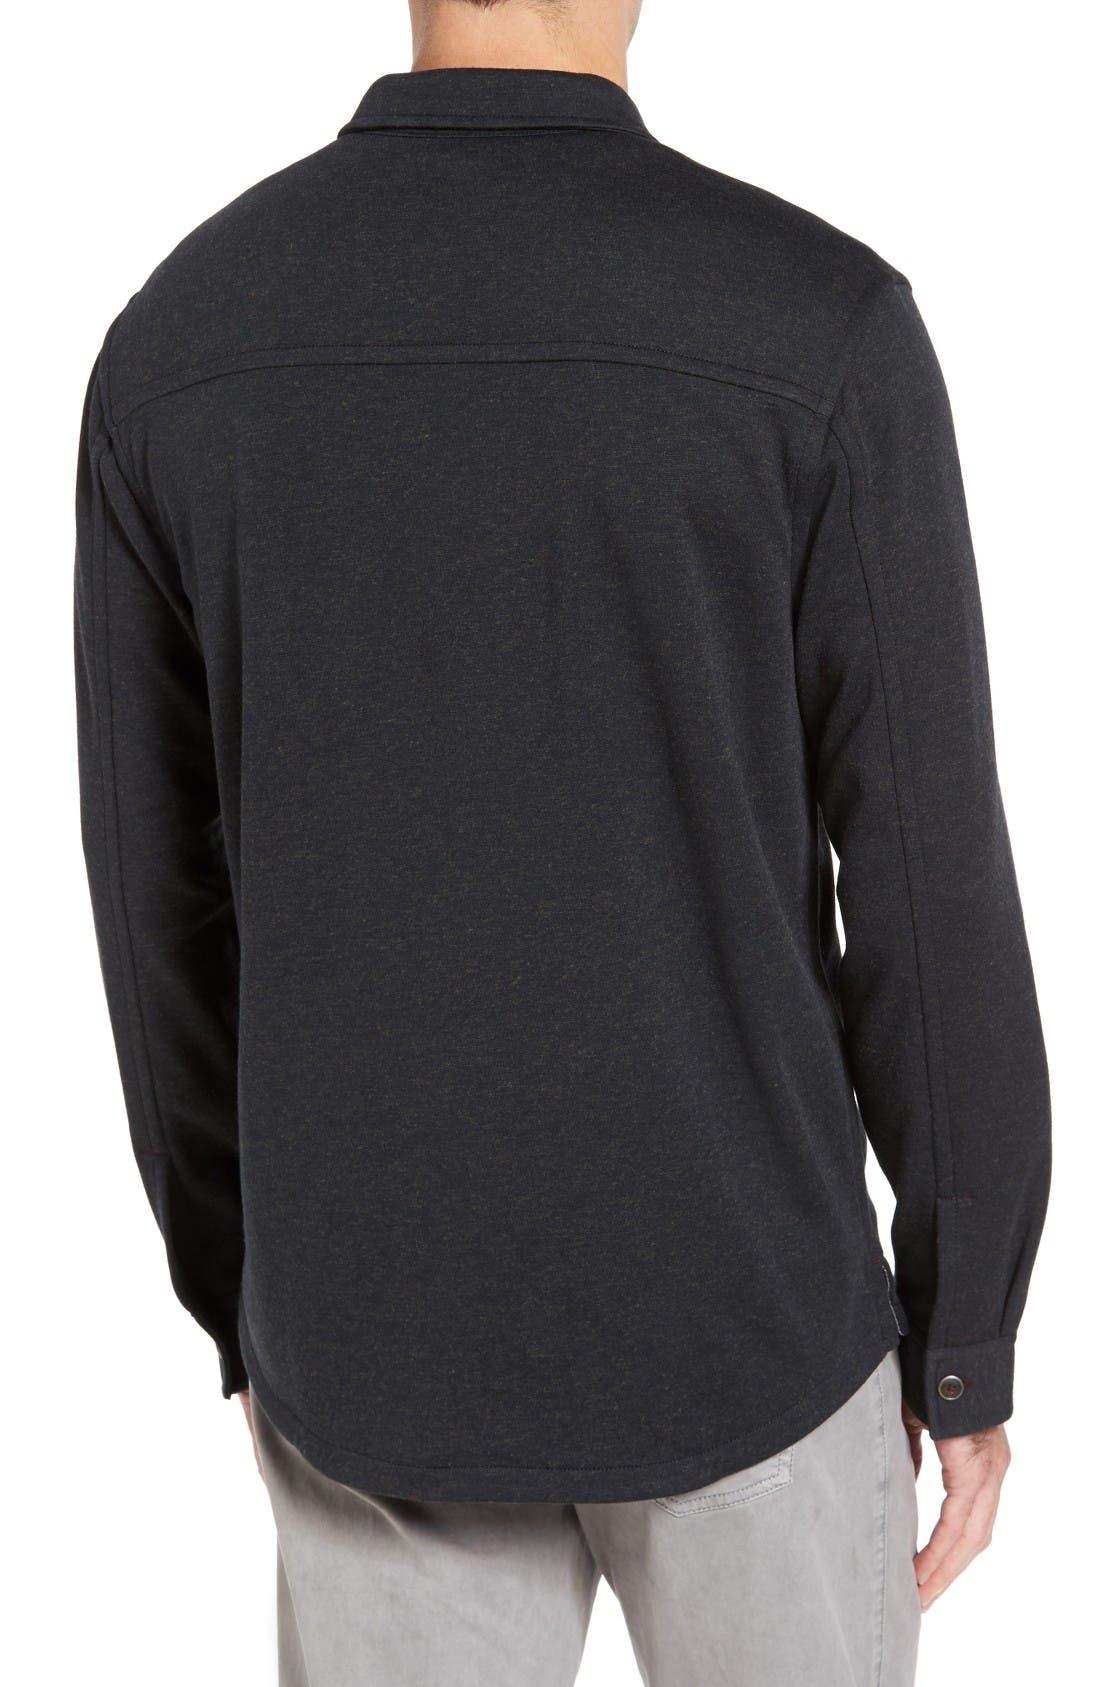 Alternate Image 2  - Tommy Bahama Barra Grande CPO Jacket